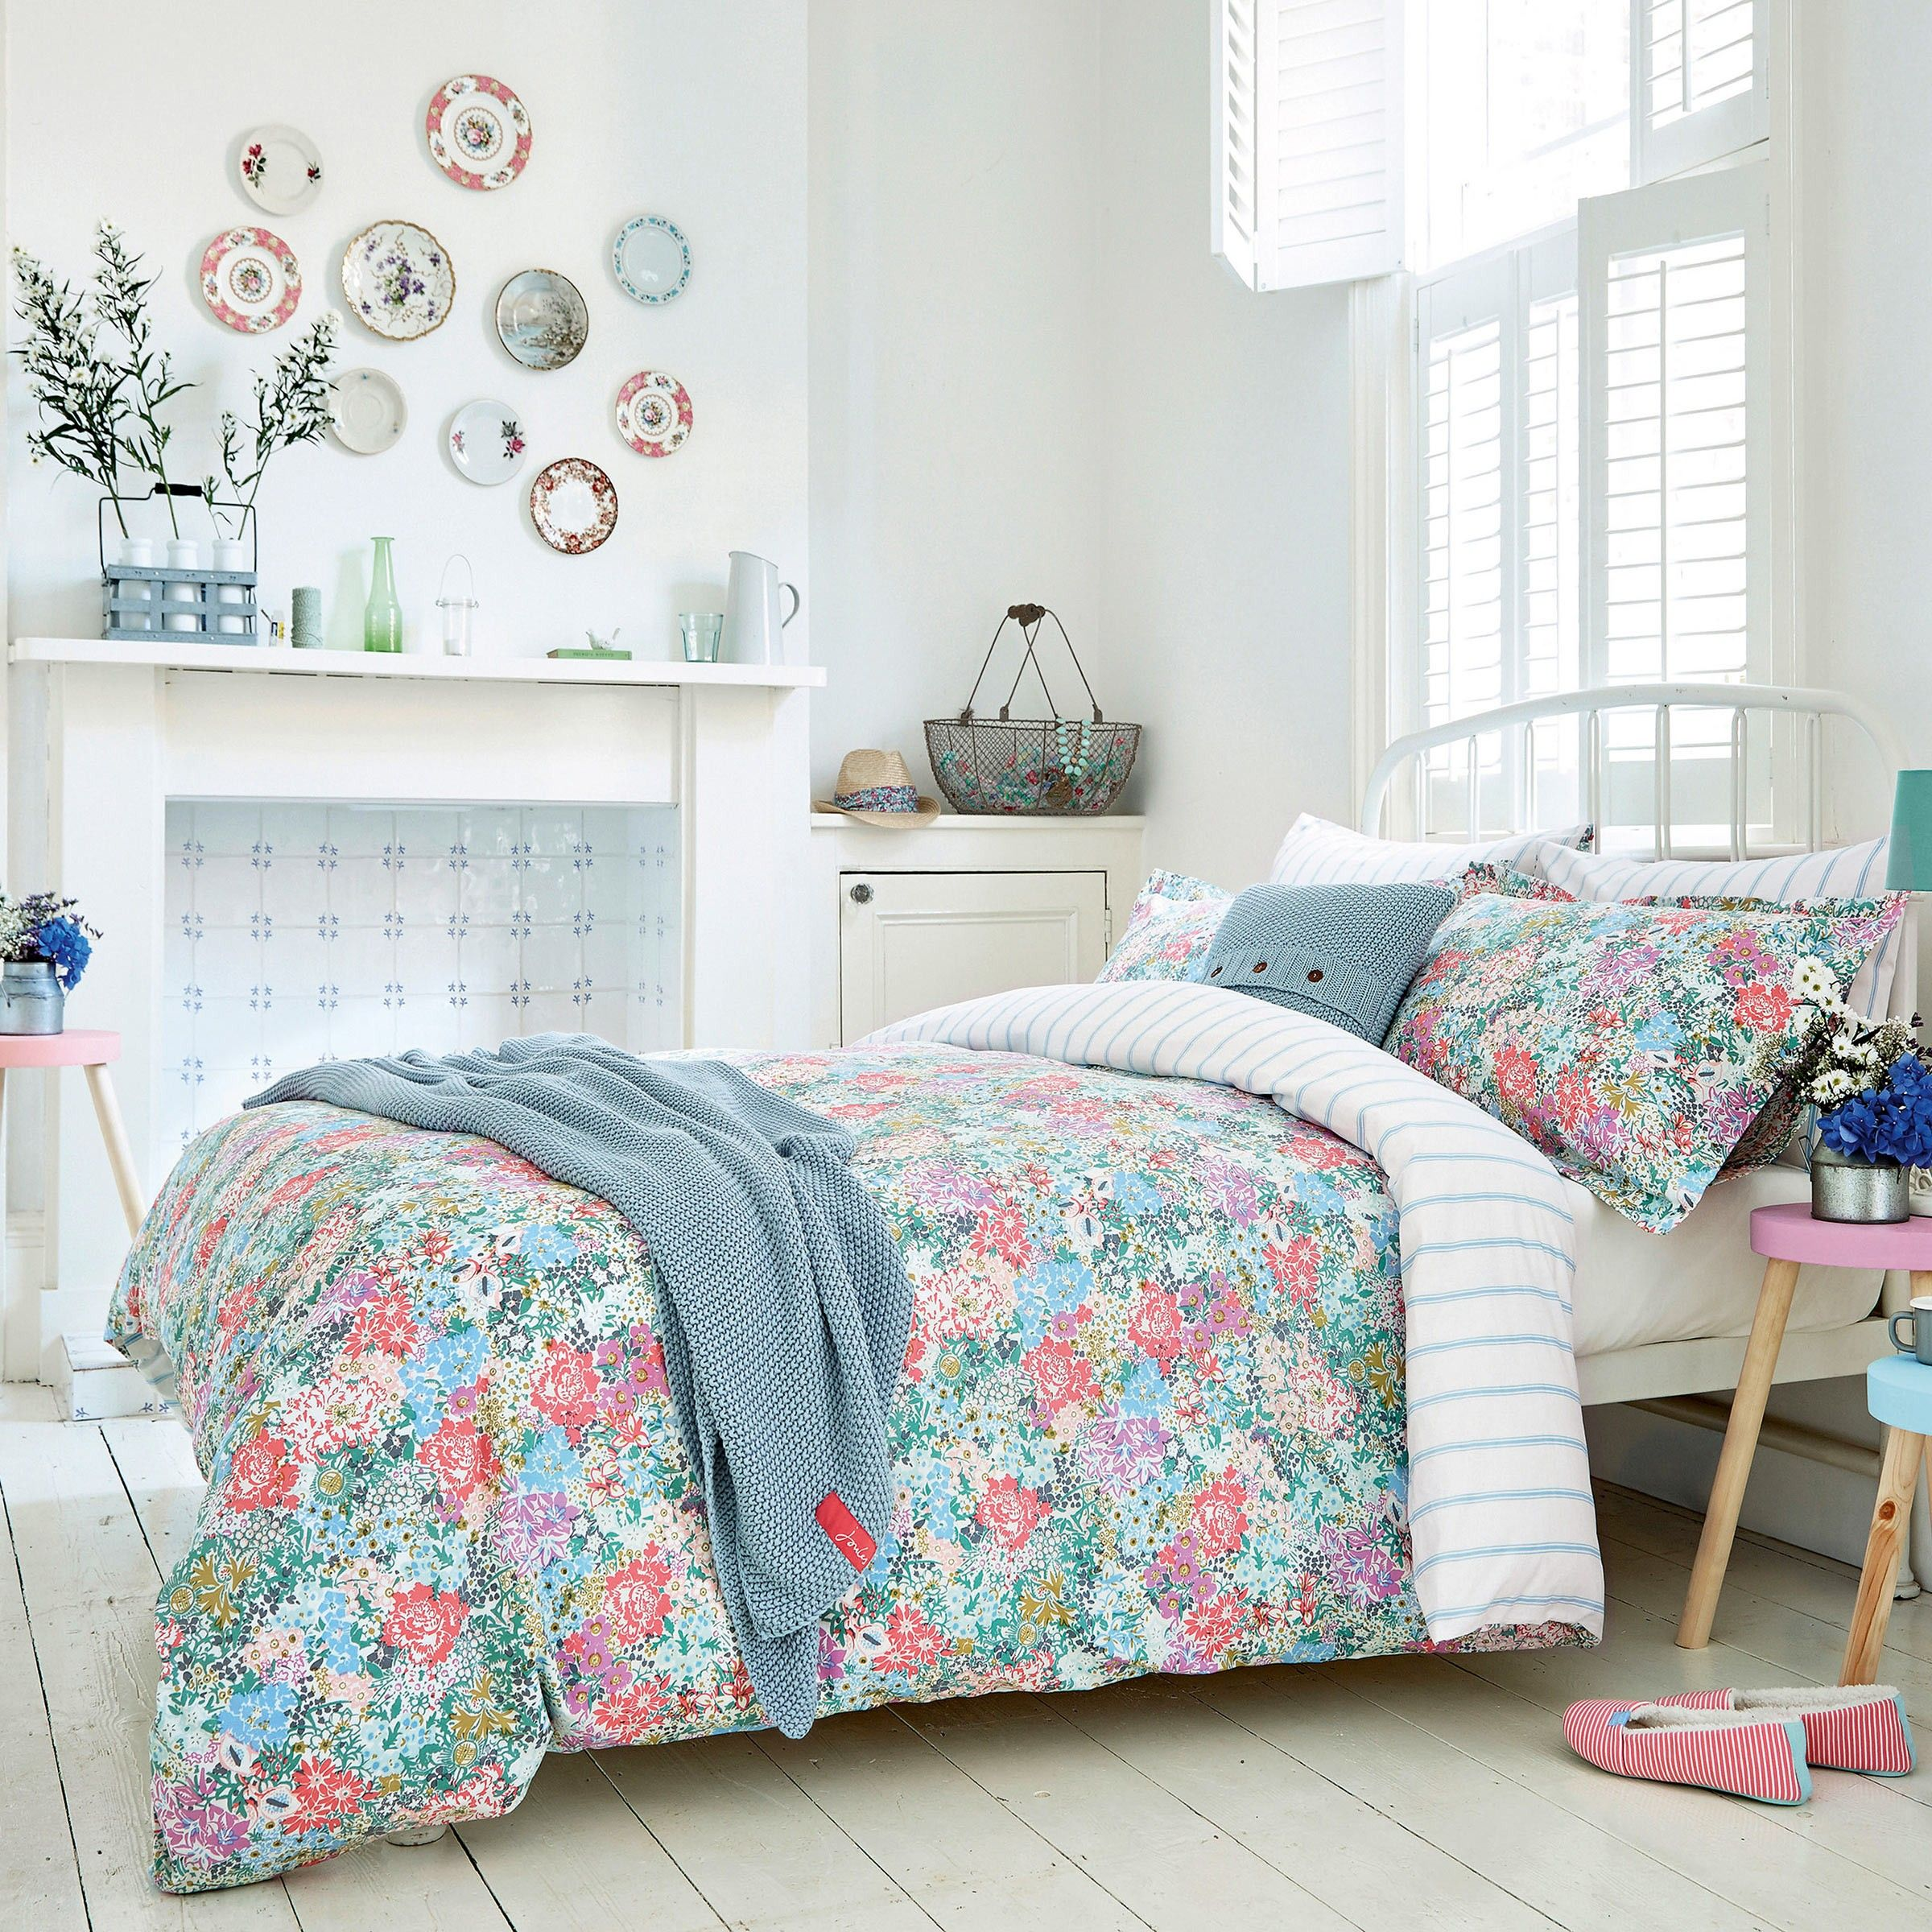 bath shipping gray overstock jurmo today comforter product grey marimekko bedding bed free